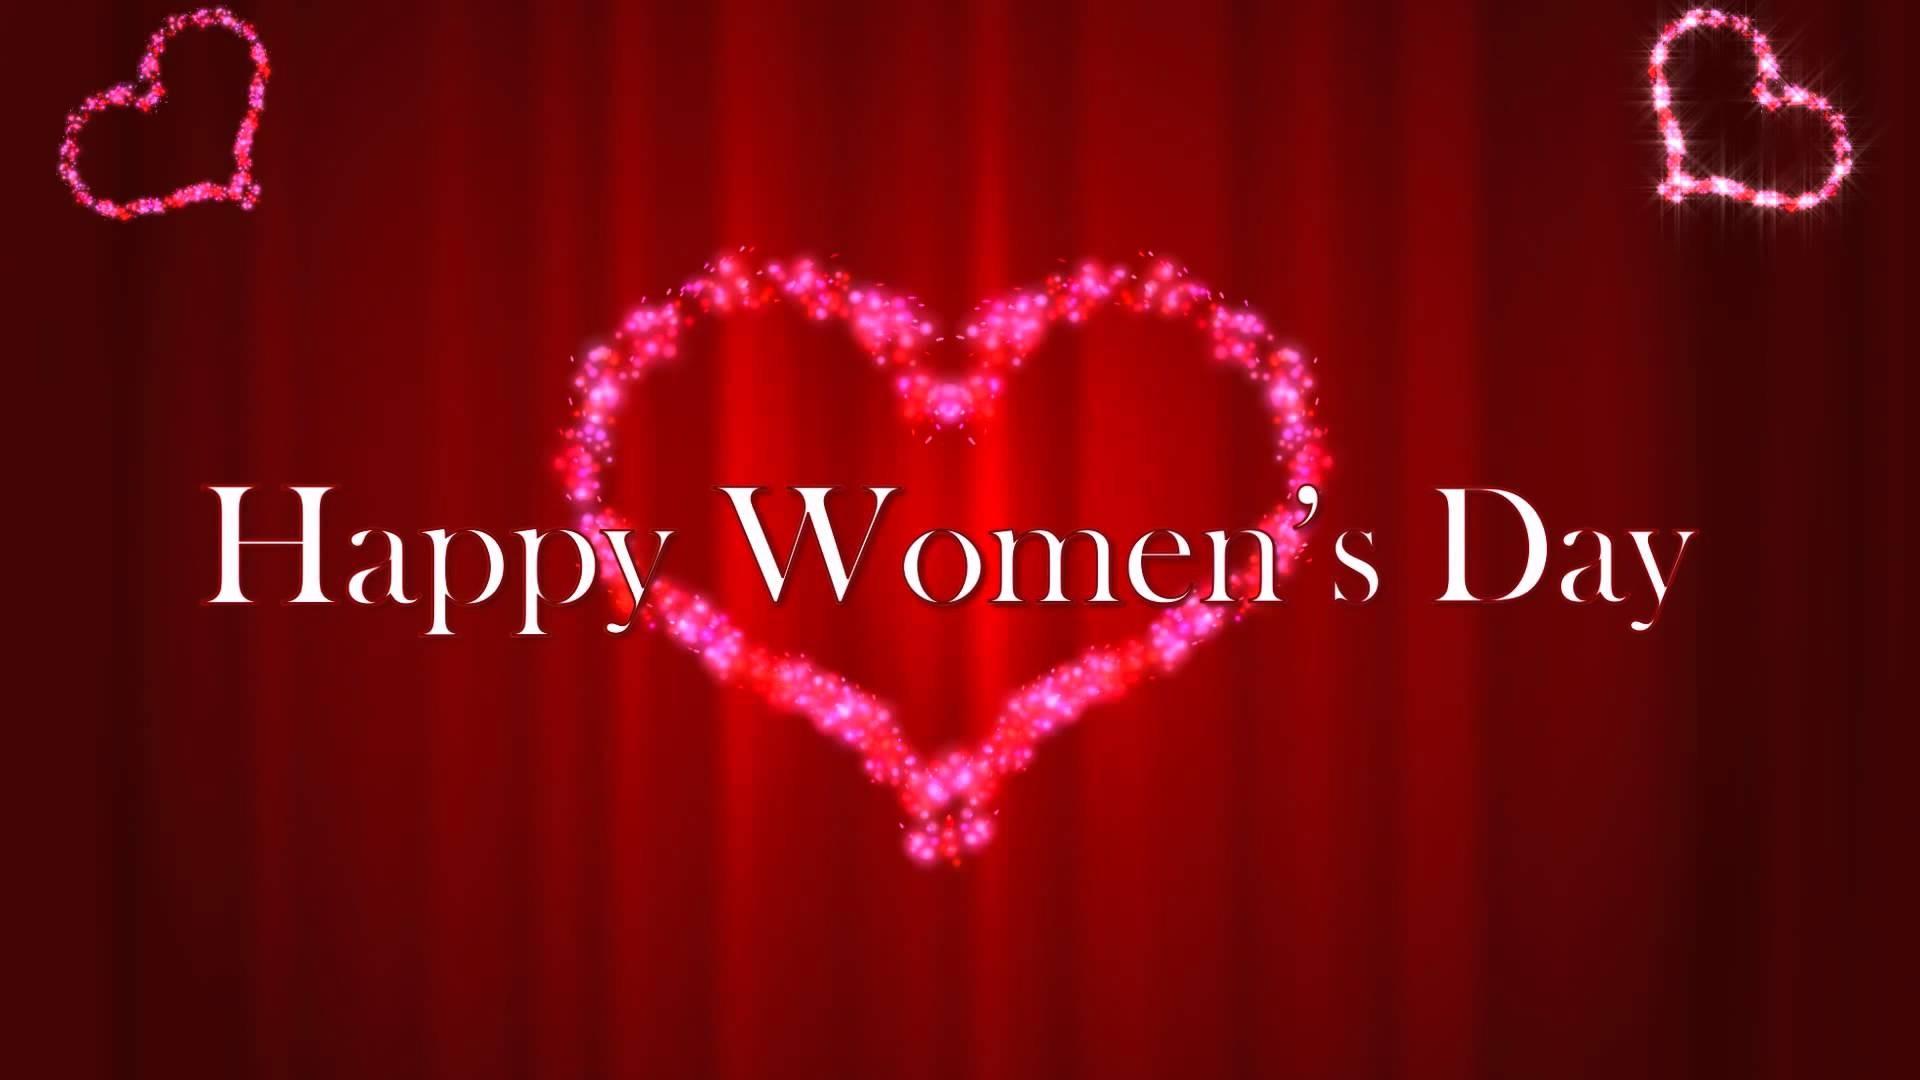 Happy Women's Day free download wallpaper